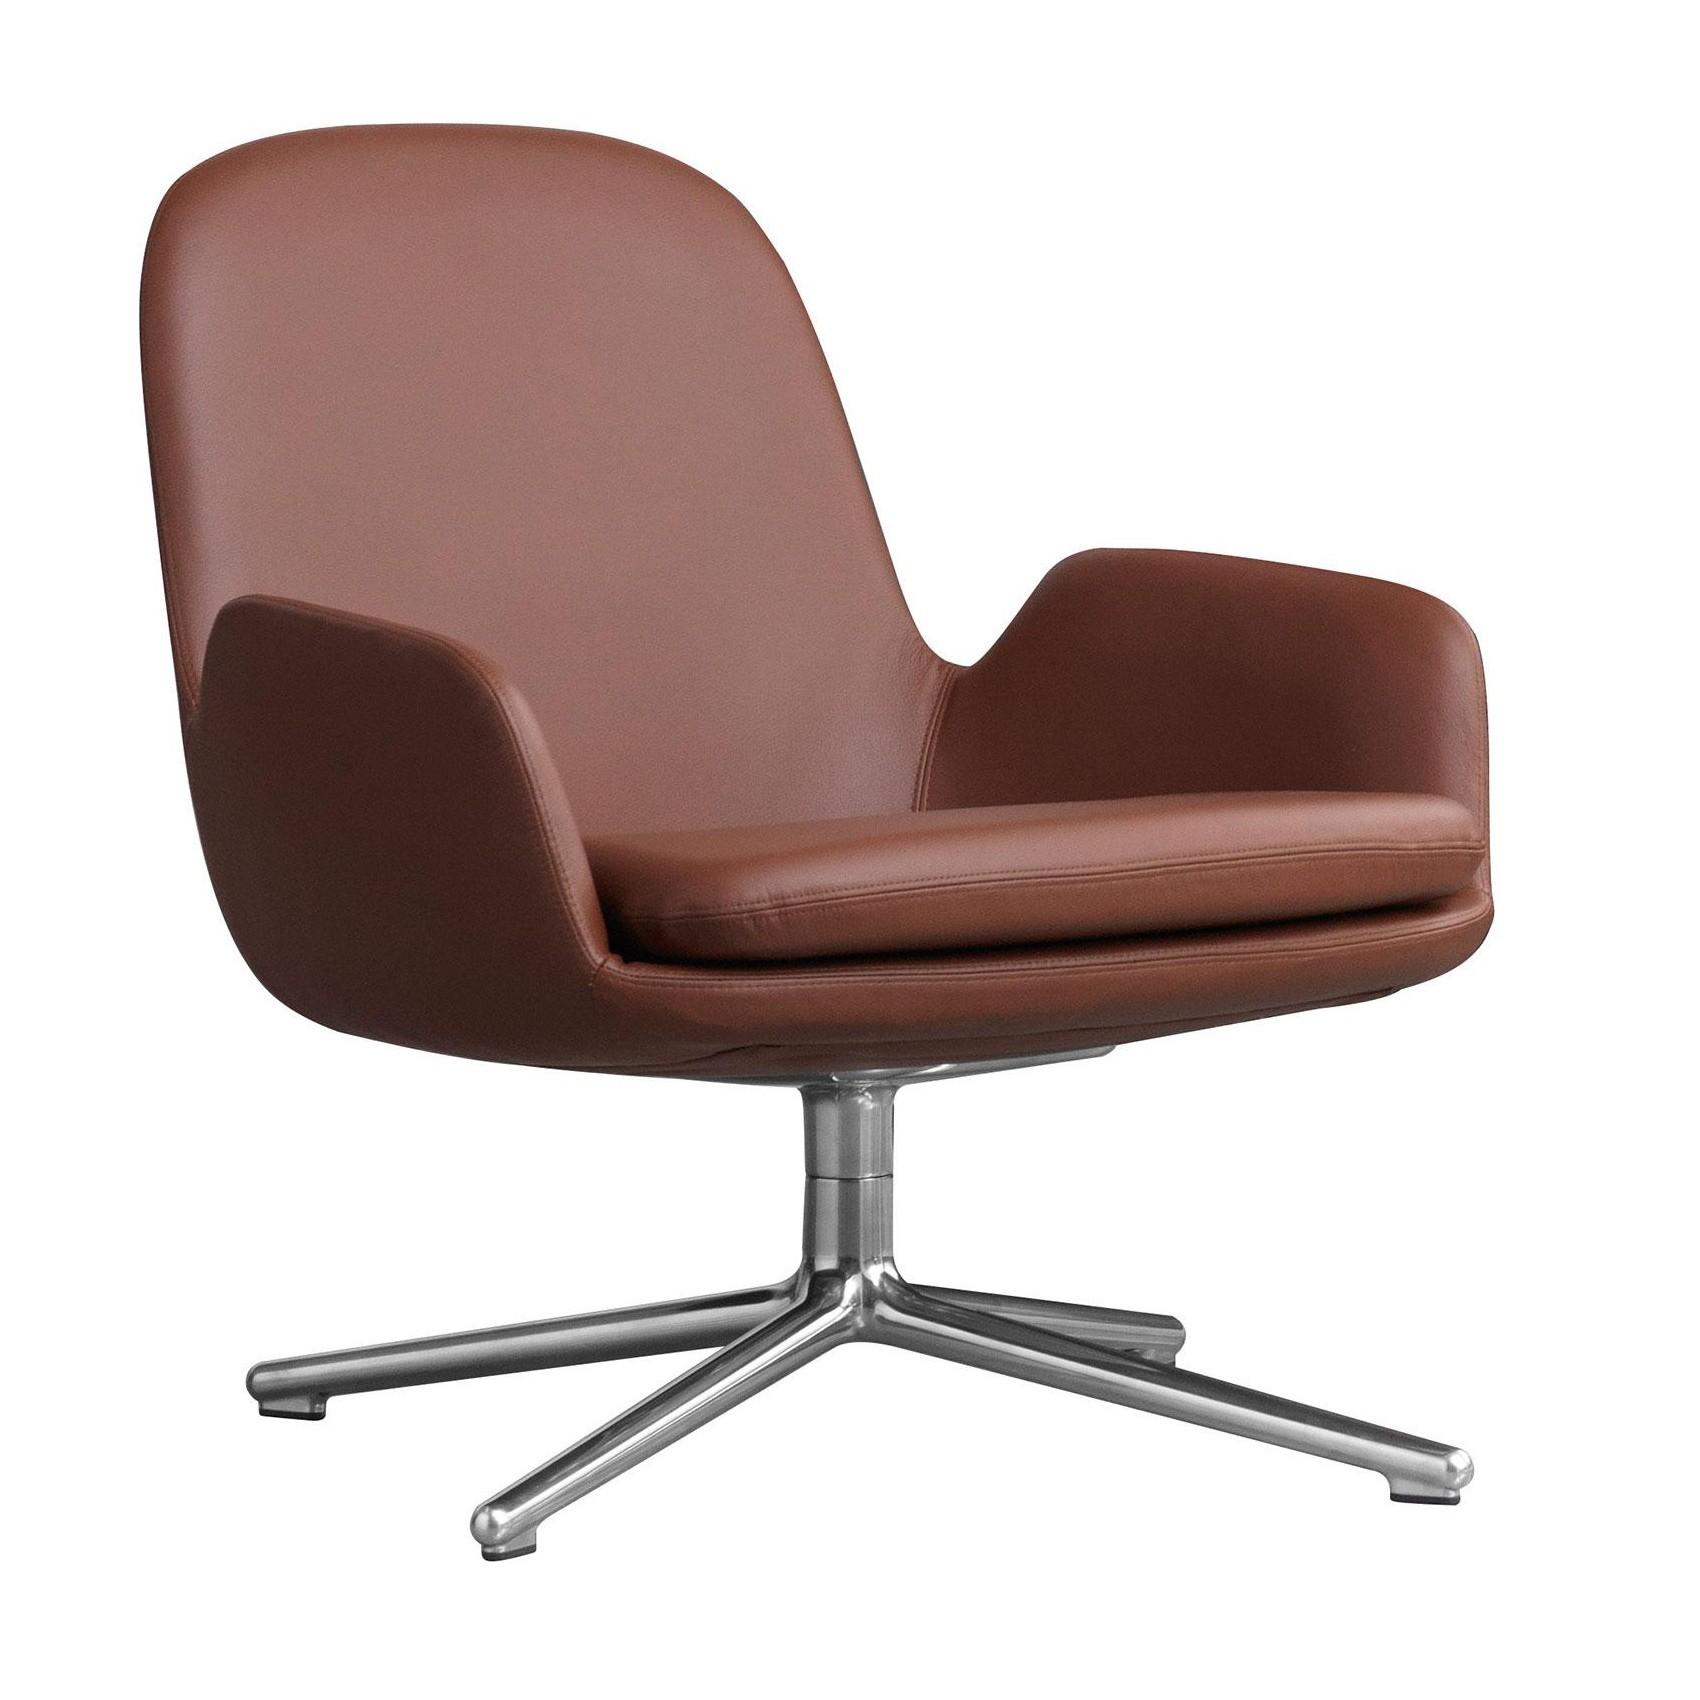 Era Lounge Chair Swivel Chair Leather Alu